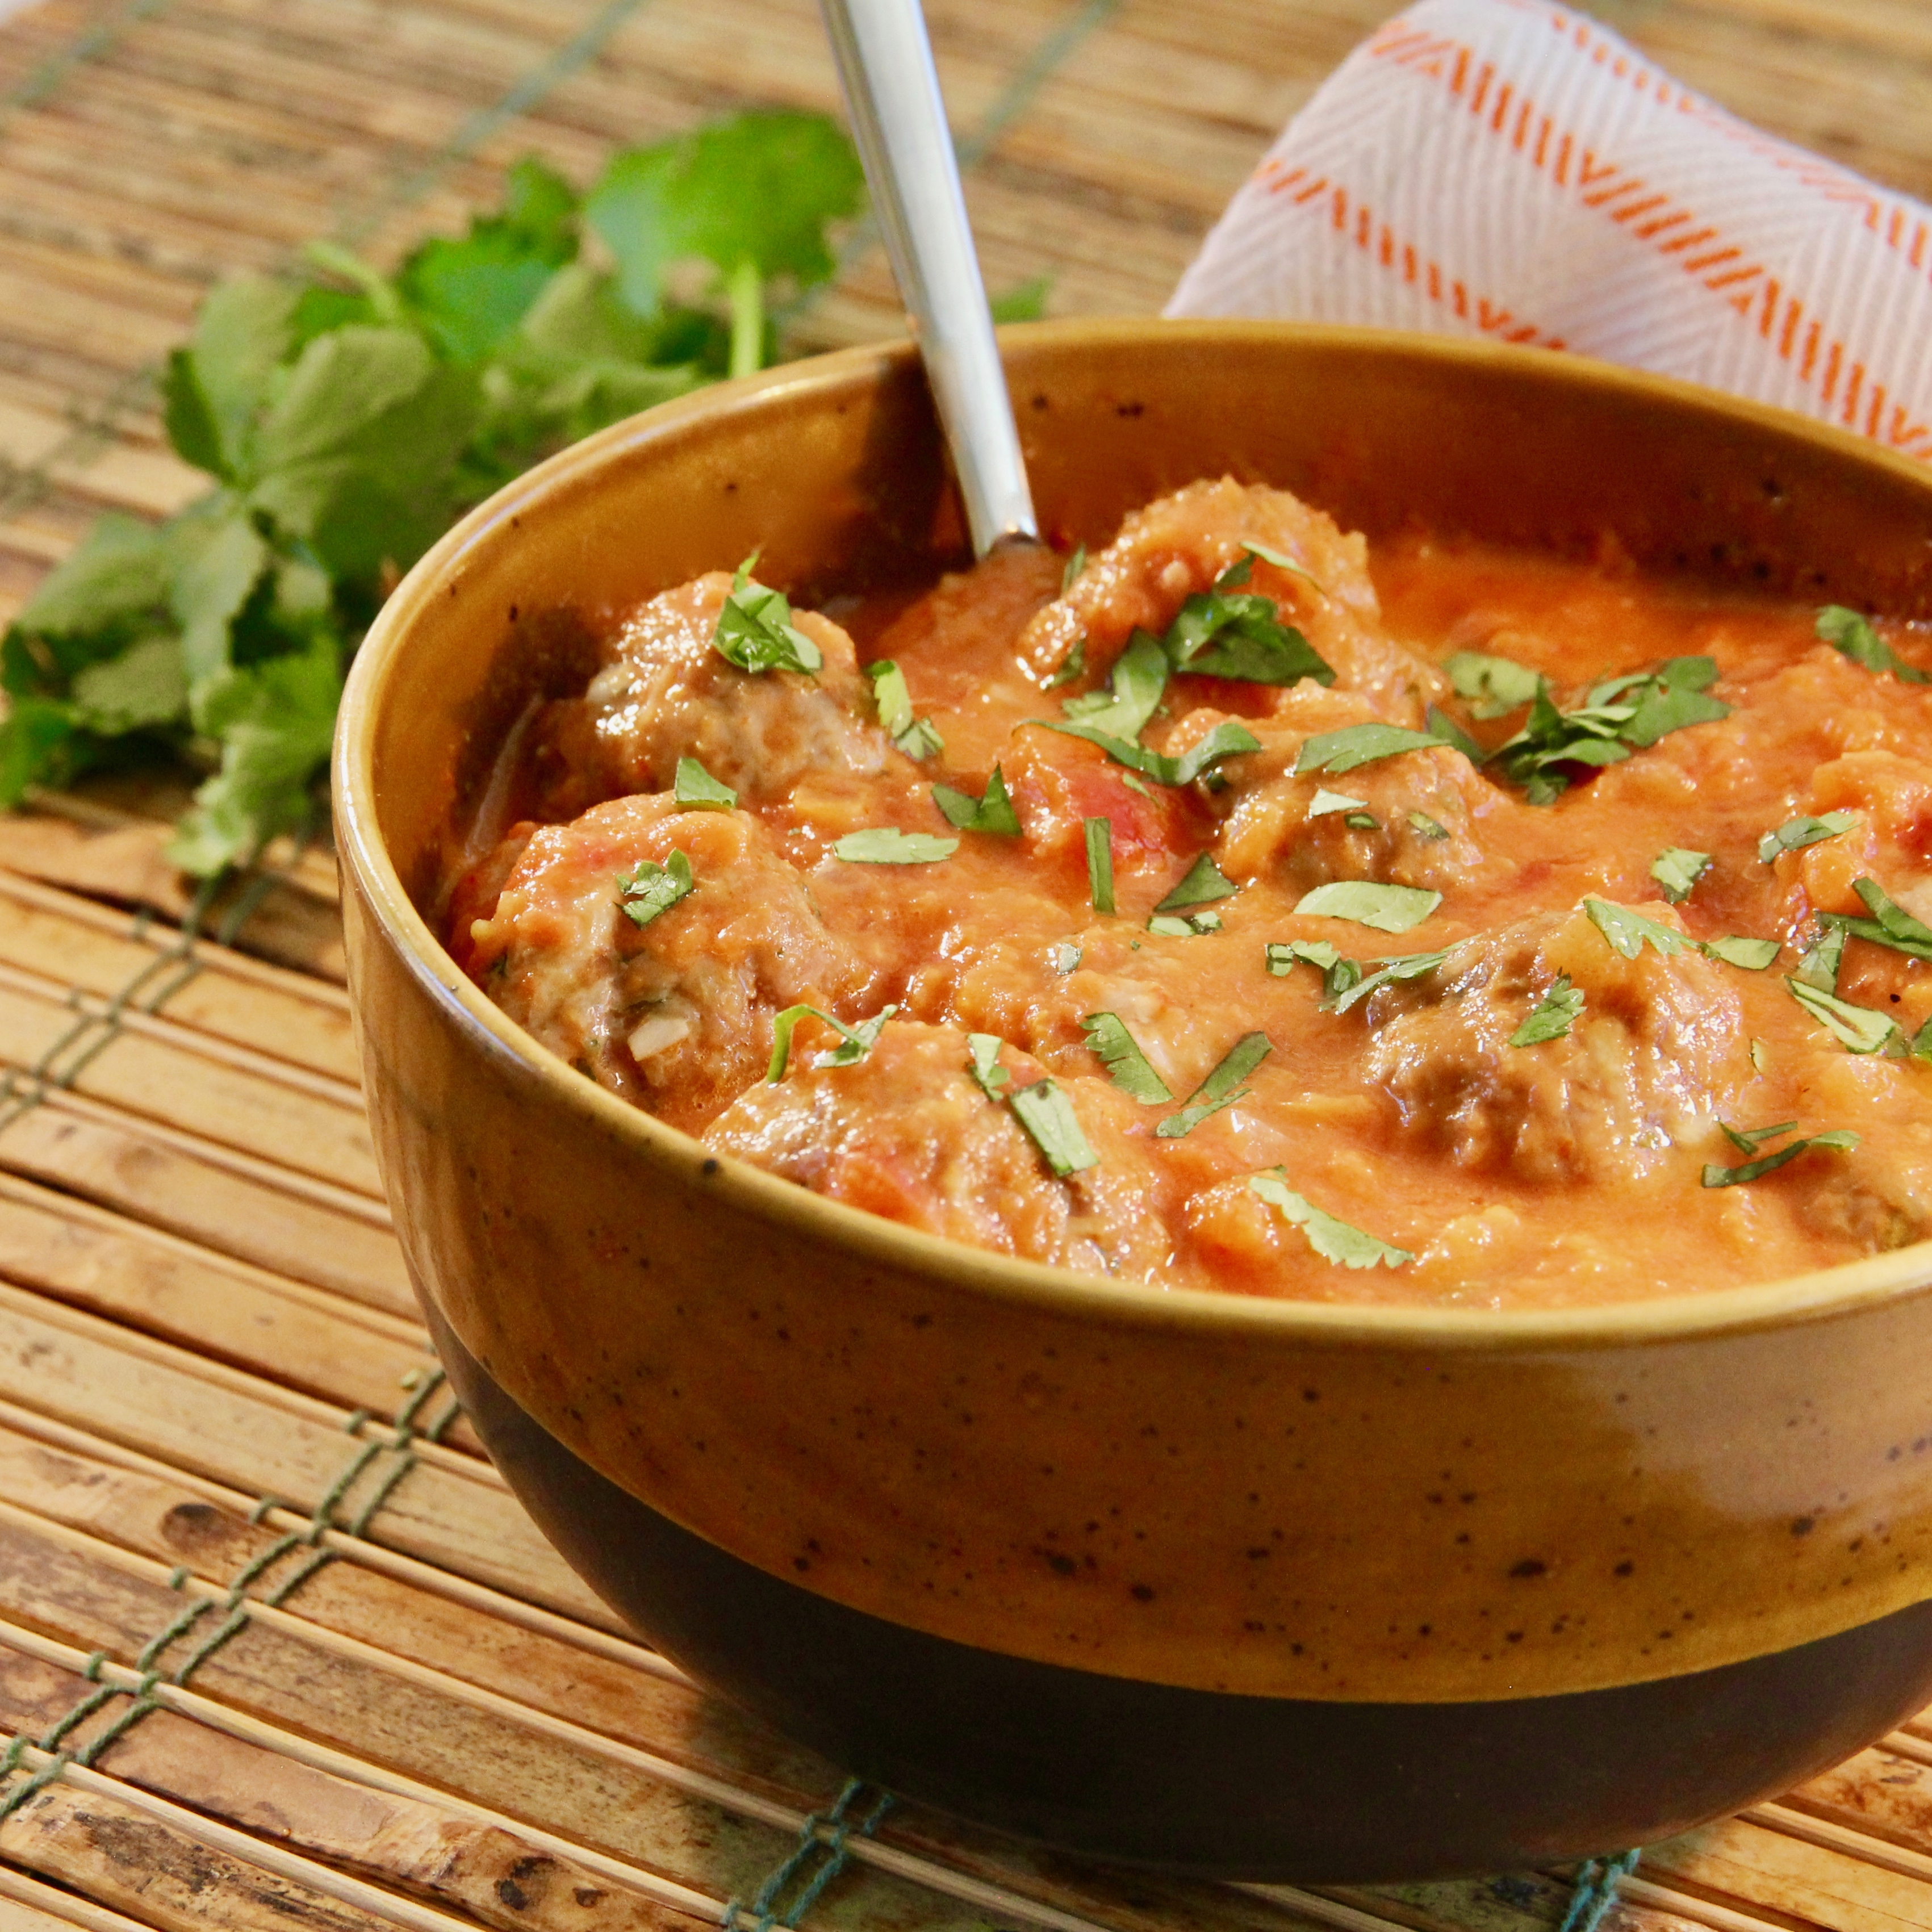 Thai Meatballs in a Tomato Coconut Curry Sauce lutzflcat